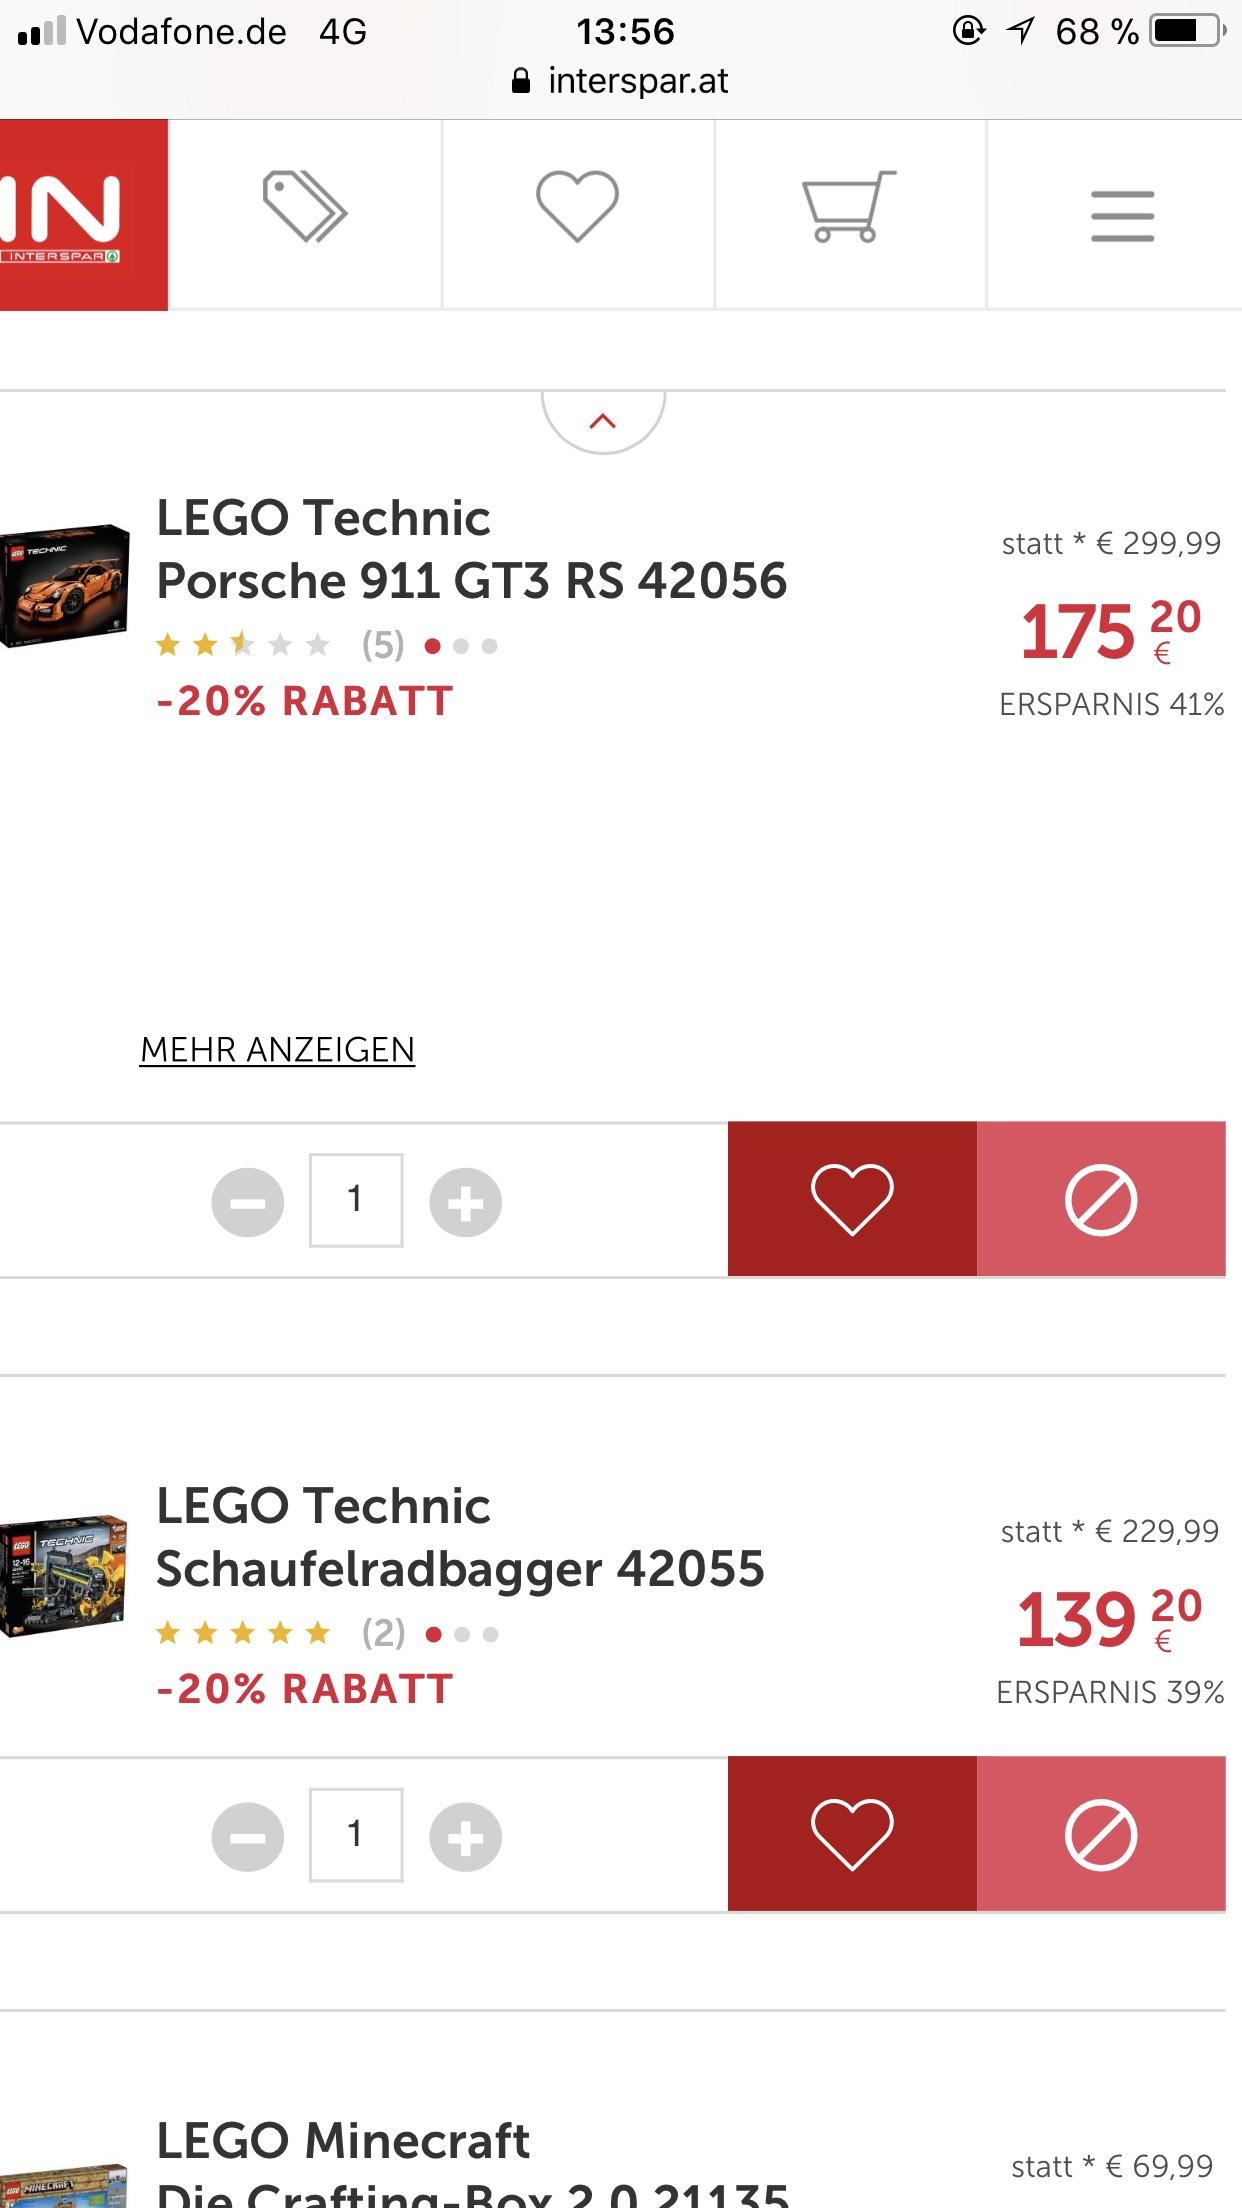 Lego Porsche GT3 RS 42056 oder Schaufelradbagger